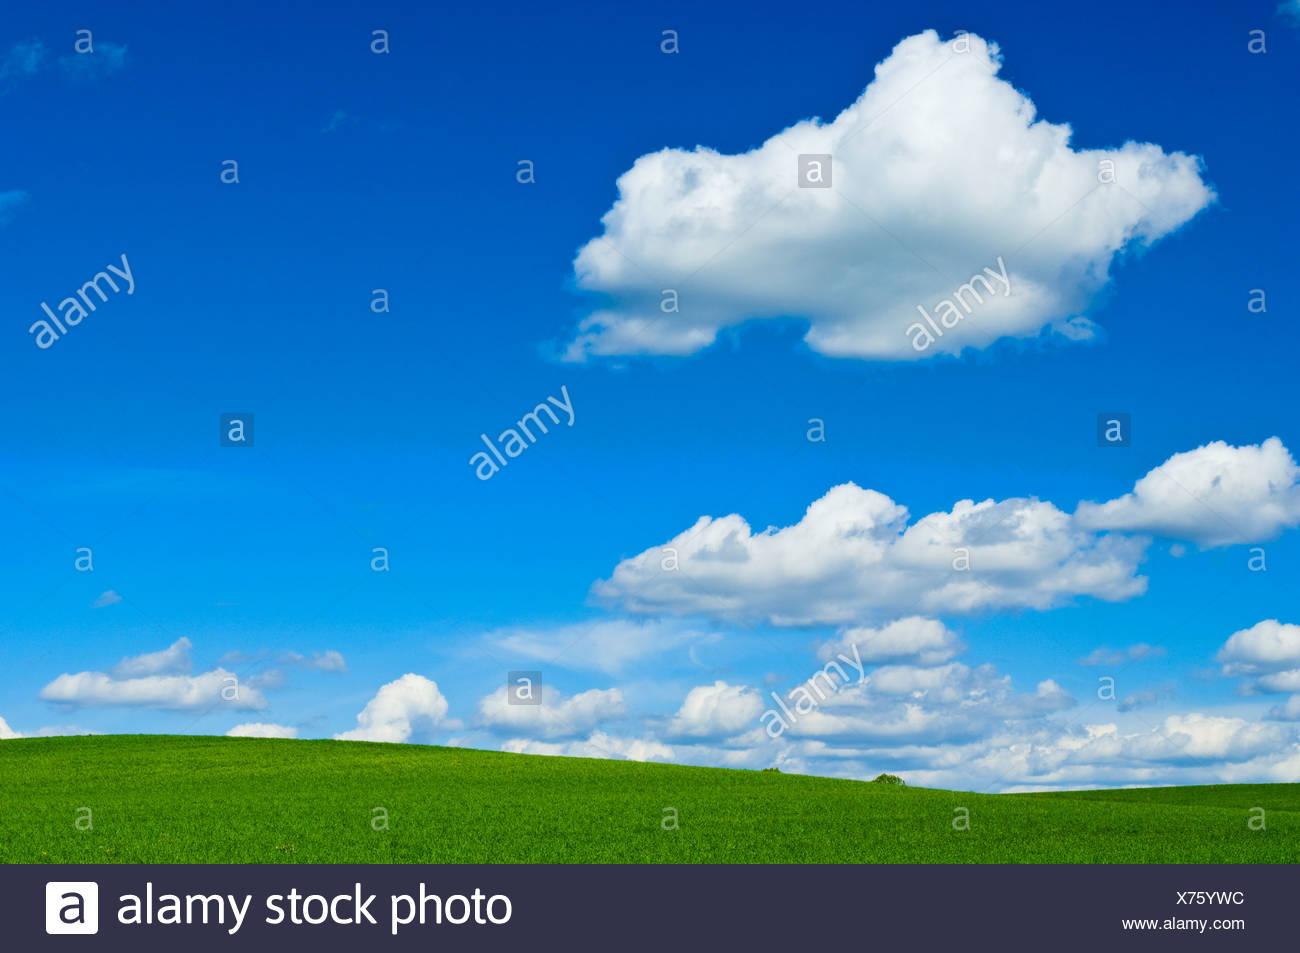 Cumulus-Wolken und grünen Feldern, Winterbourne, Ontario, Kanada Stockbild